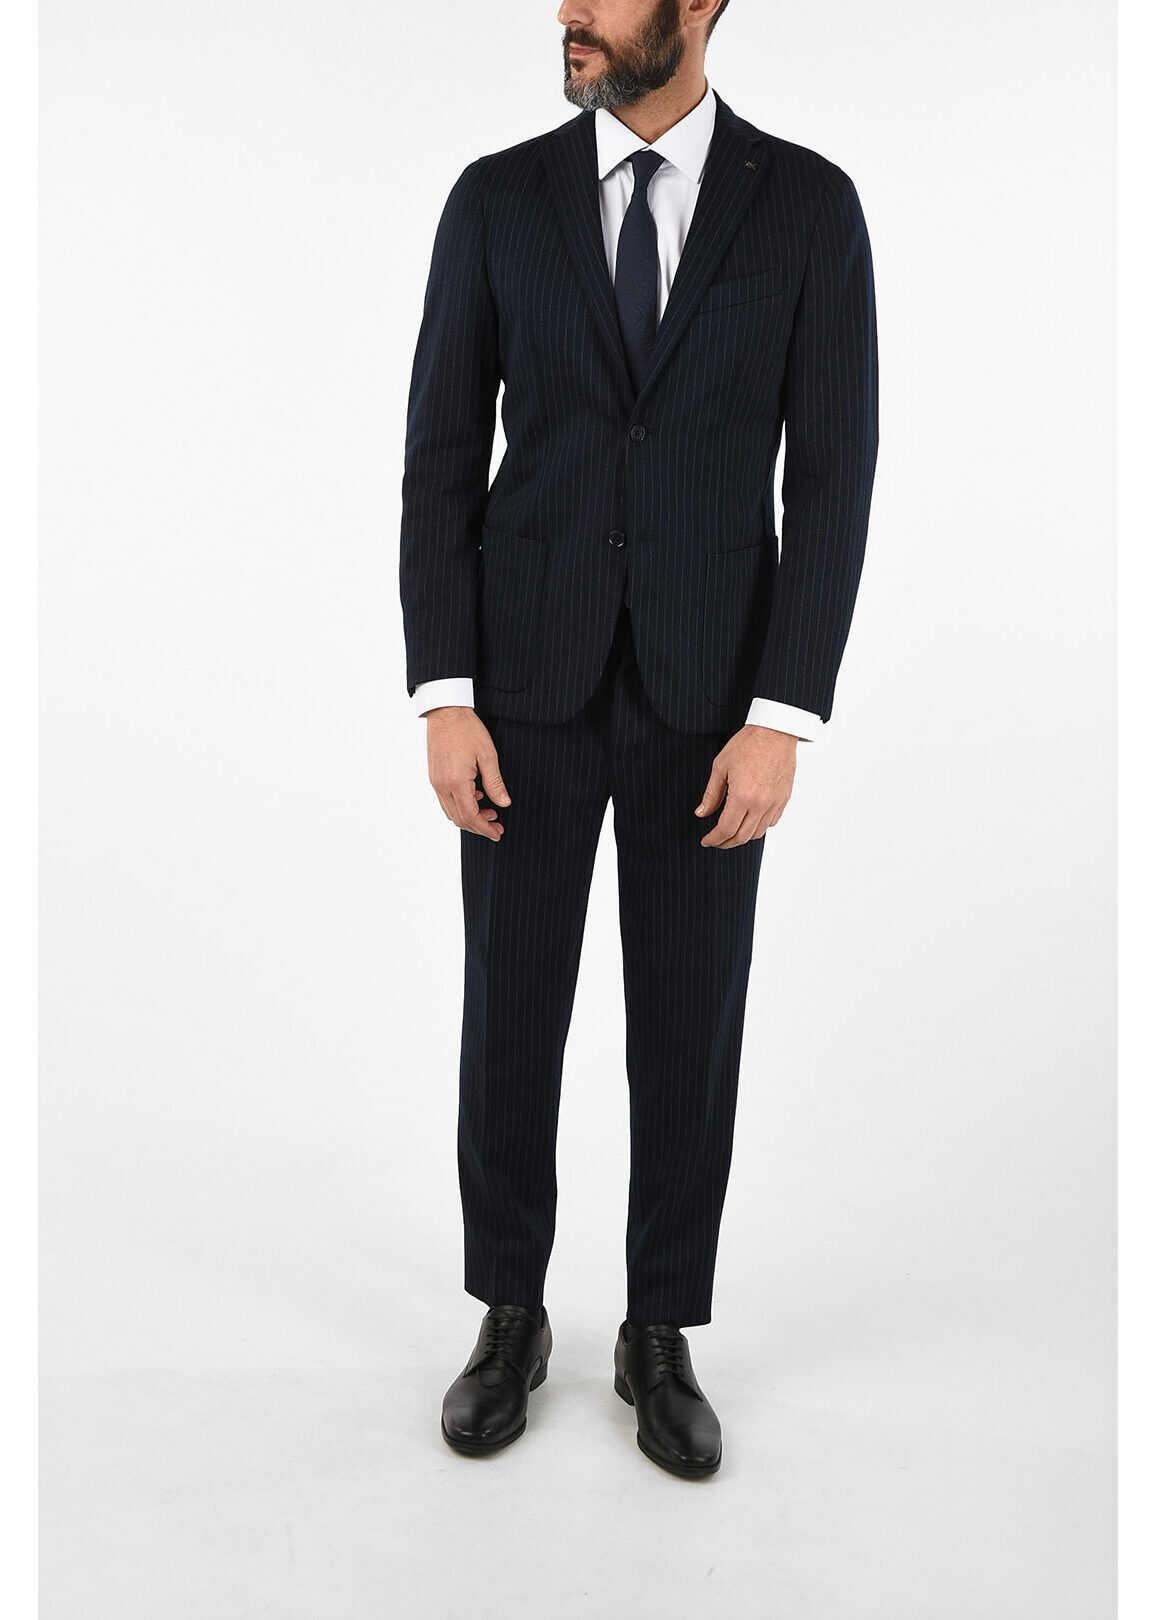 CORNELIANI CC COLLECTION RESET pinstriped drop 8R suit BLUE imagine